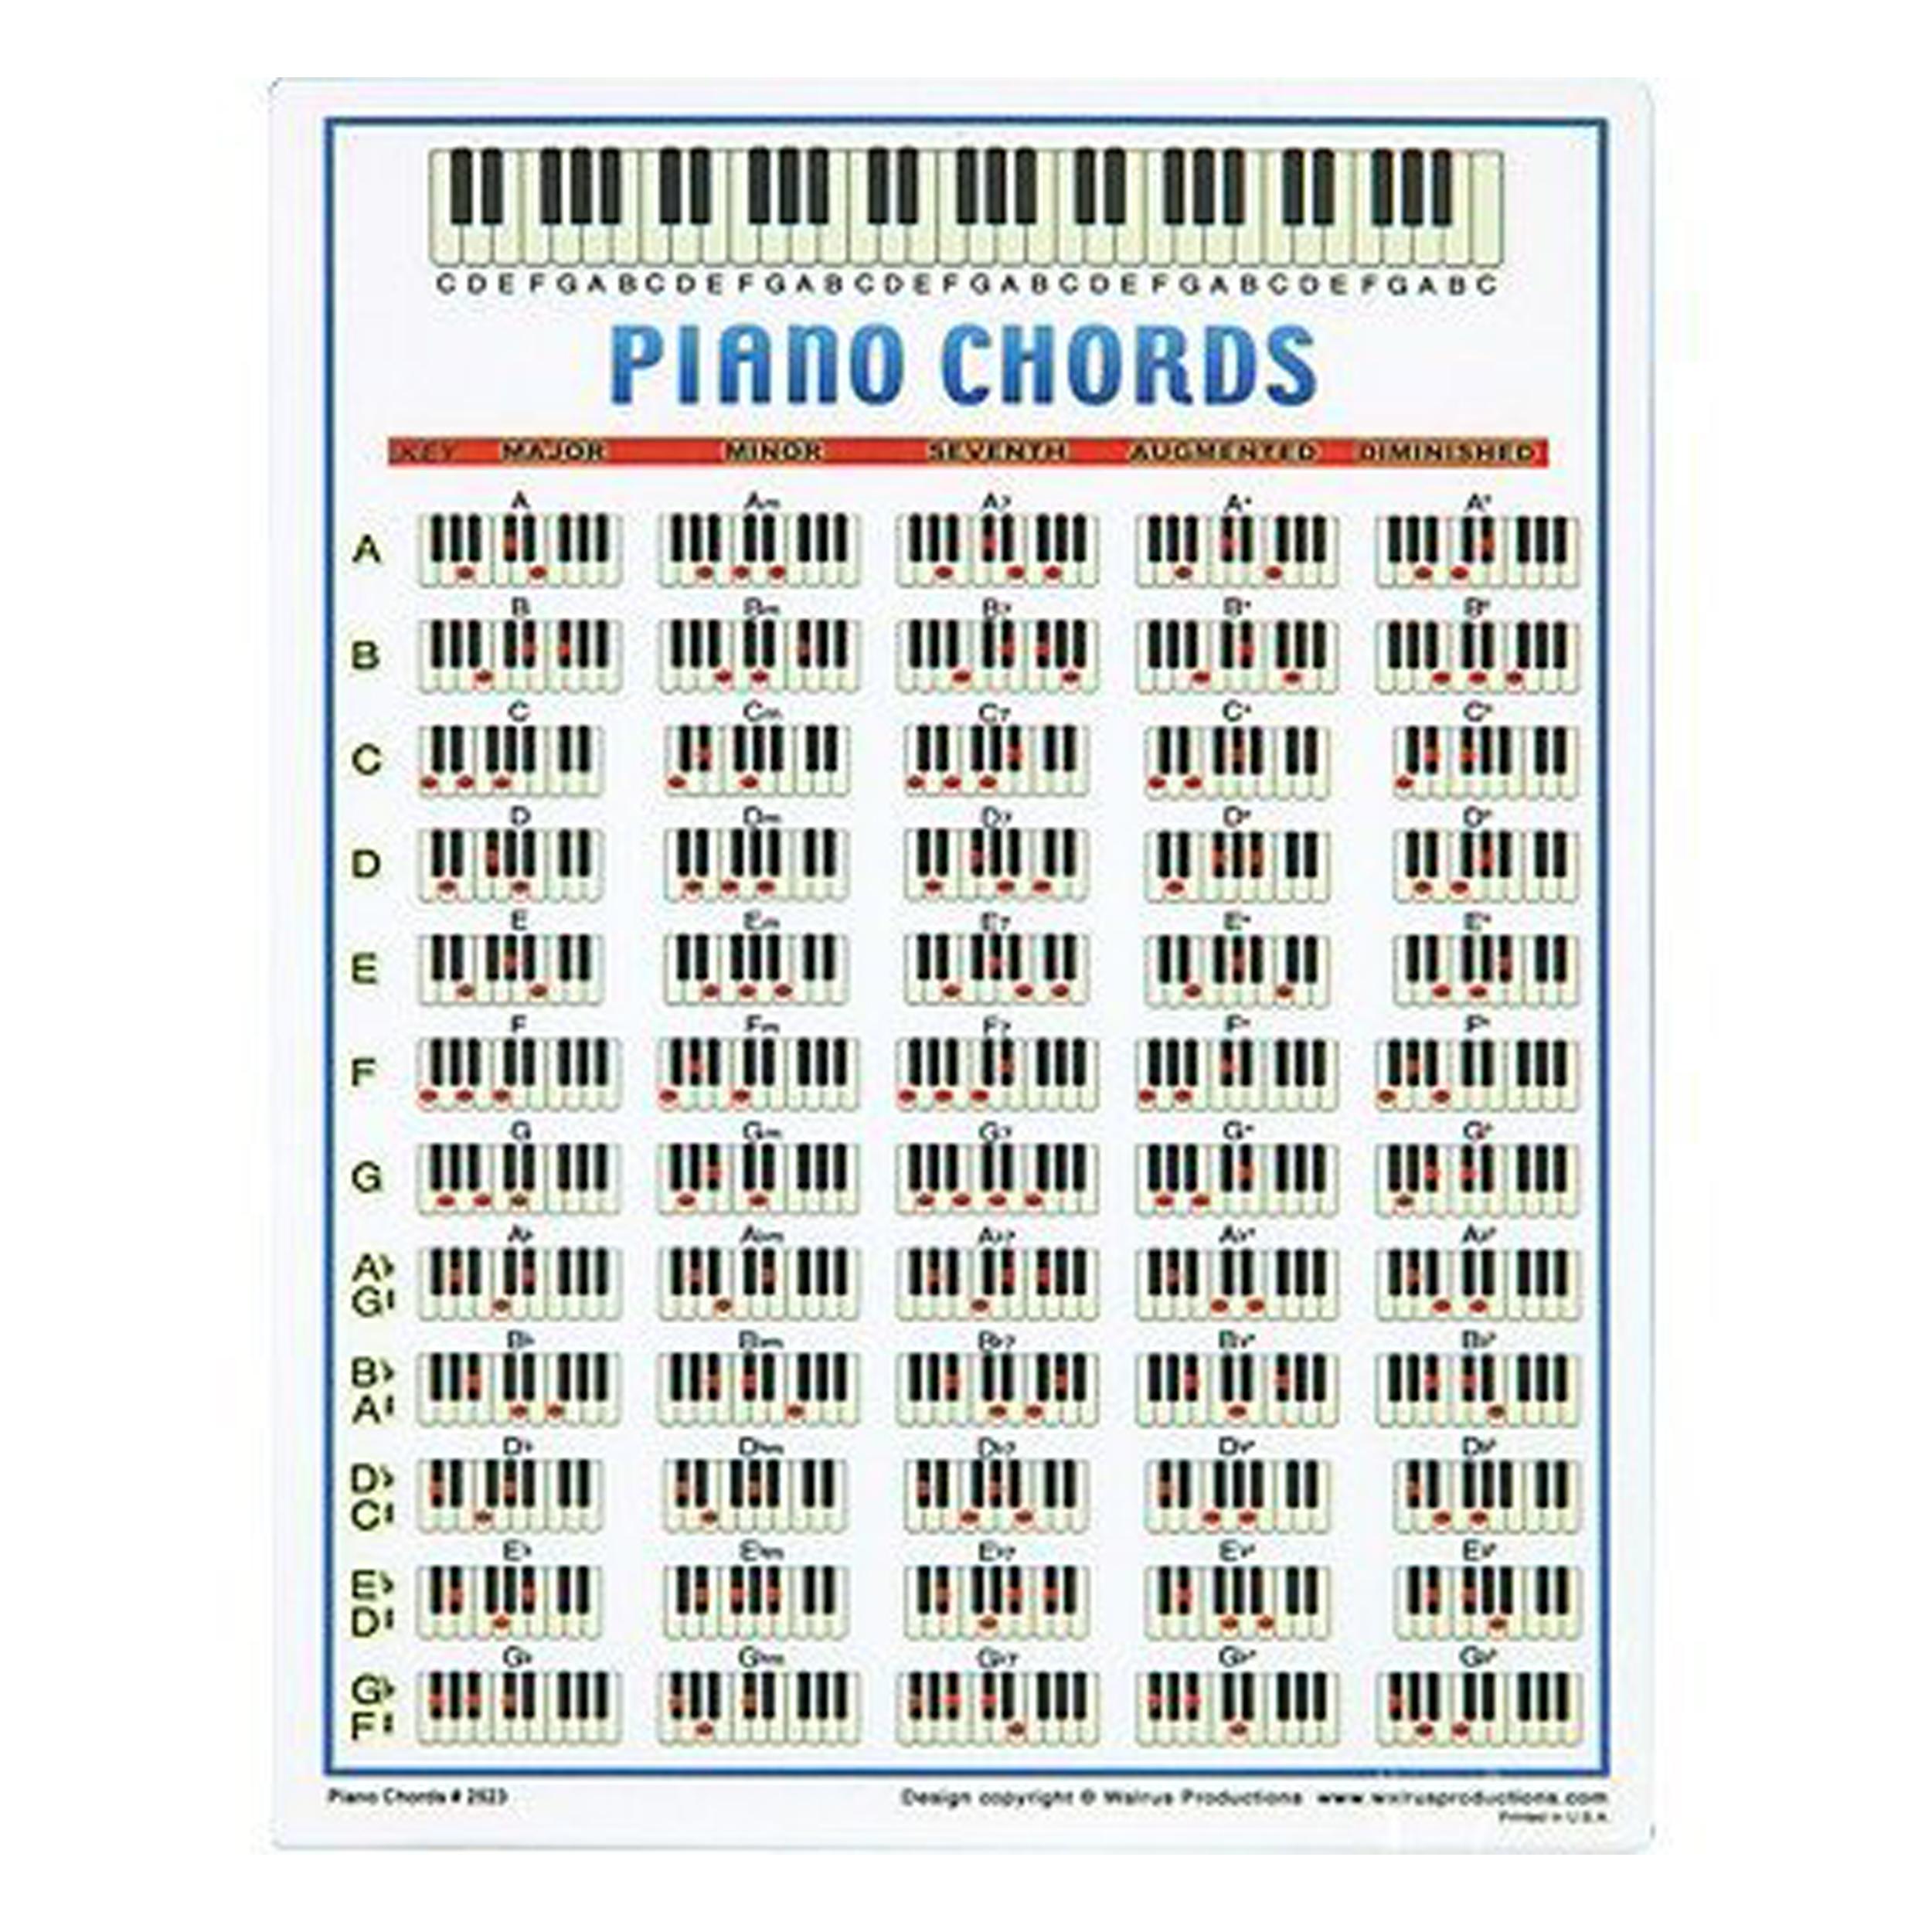 Piano Chords Chart Walrus Productions Piano Chord Mini Chart